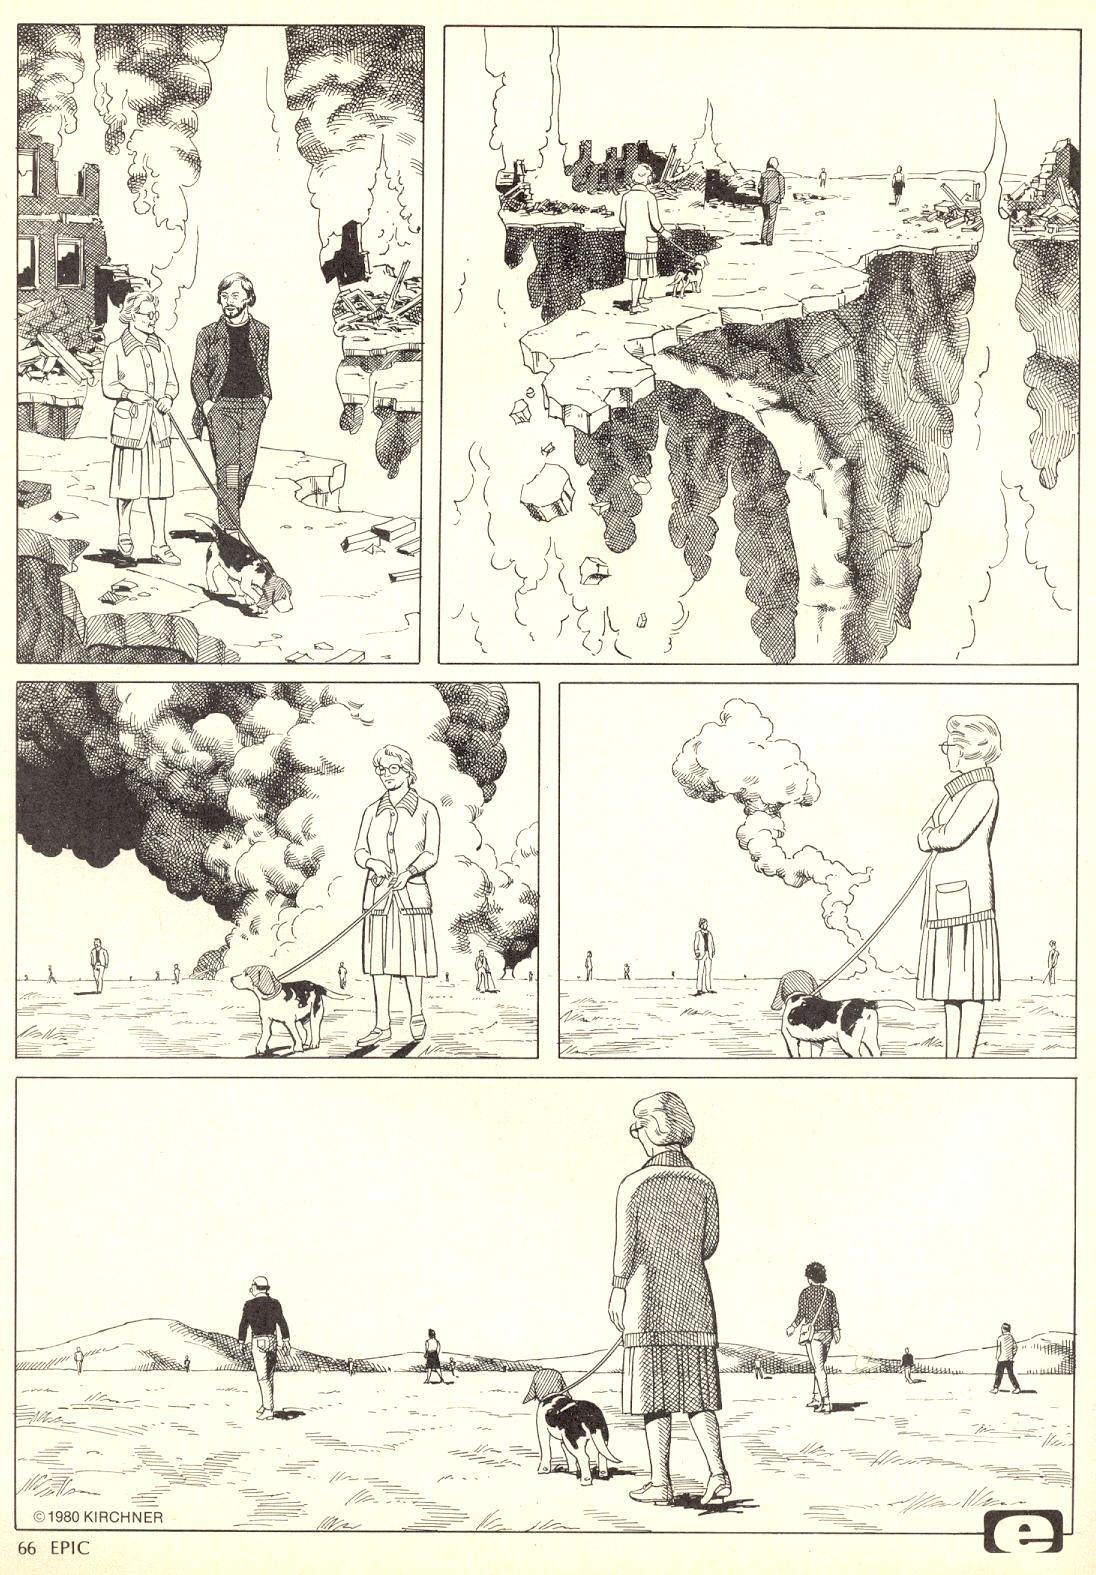 Epic Illustrated (1980) #4 Survivors pg3.